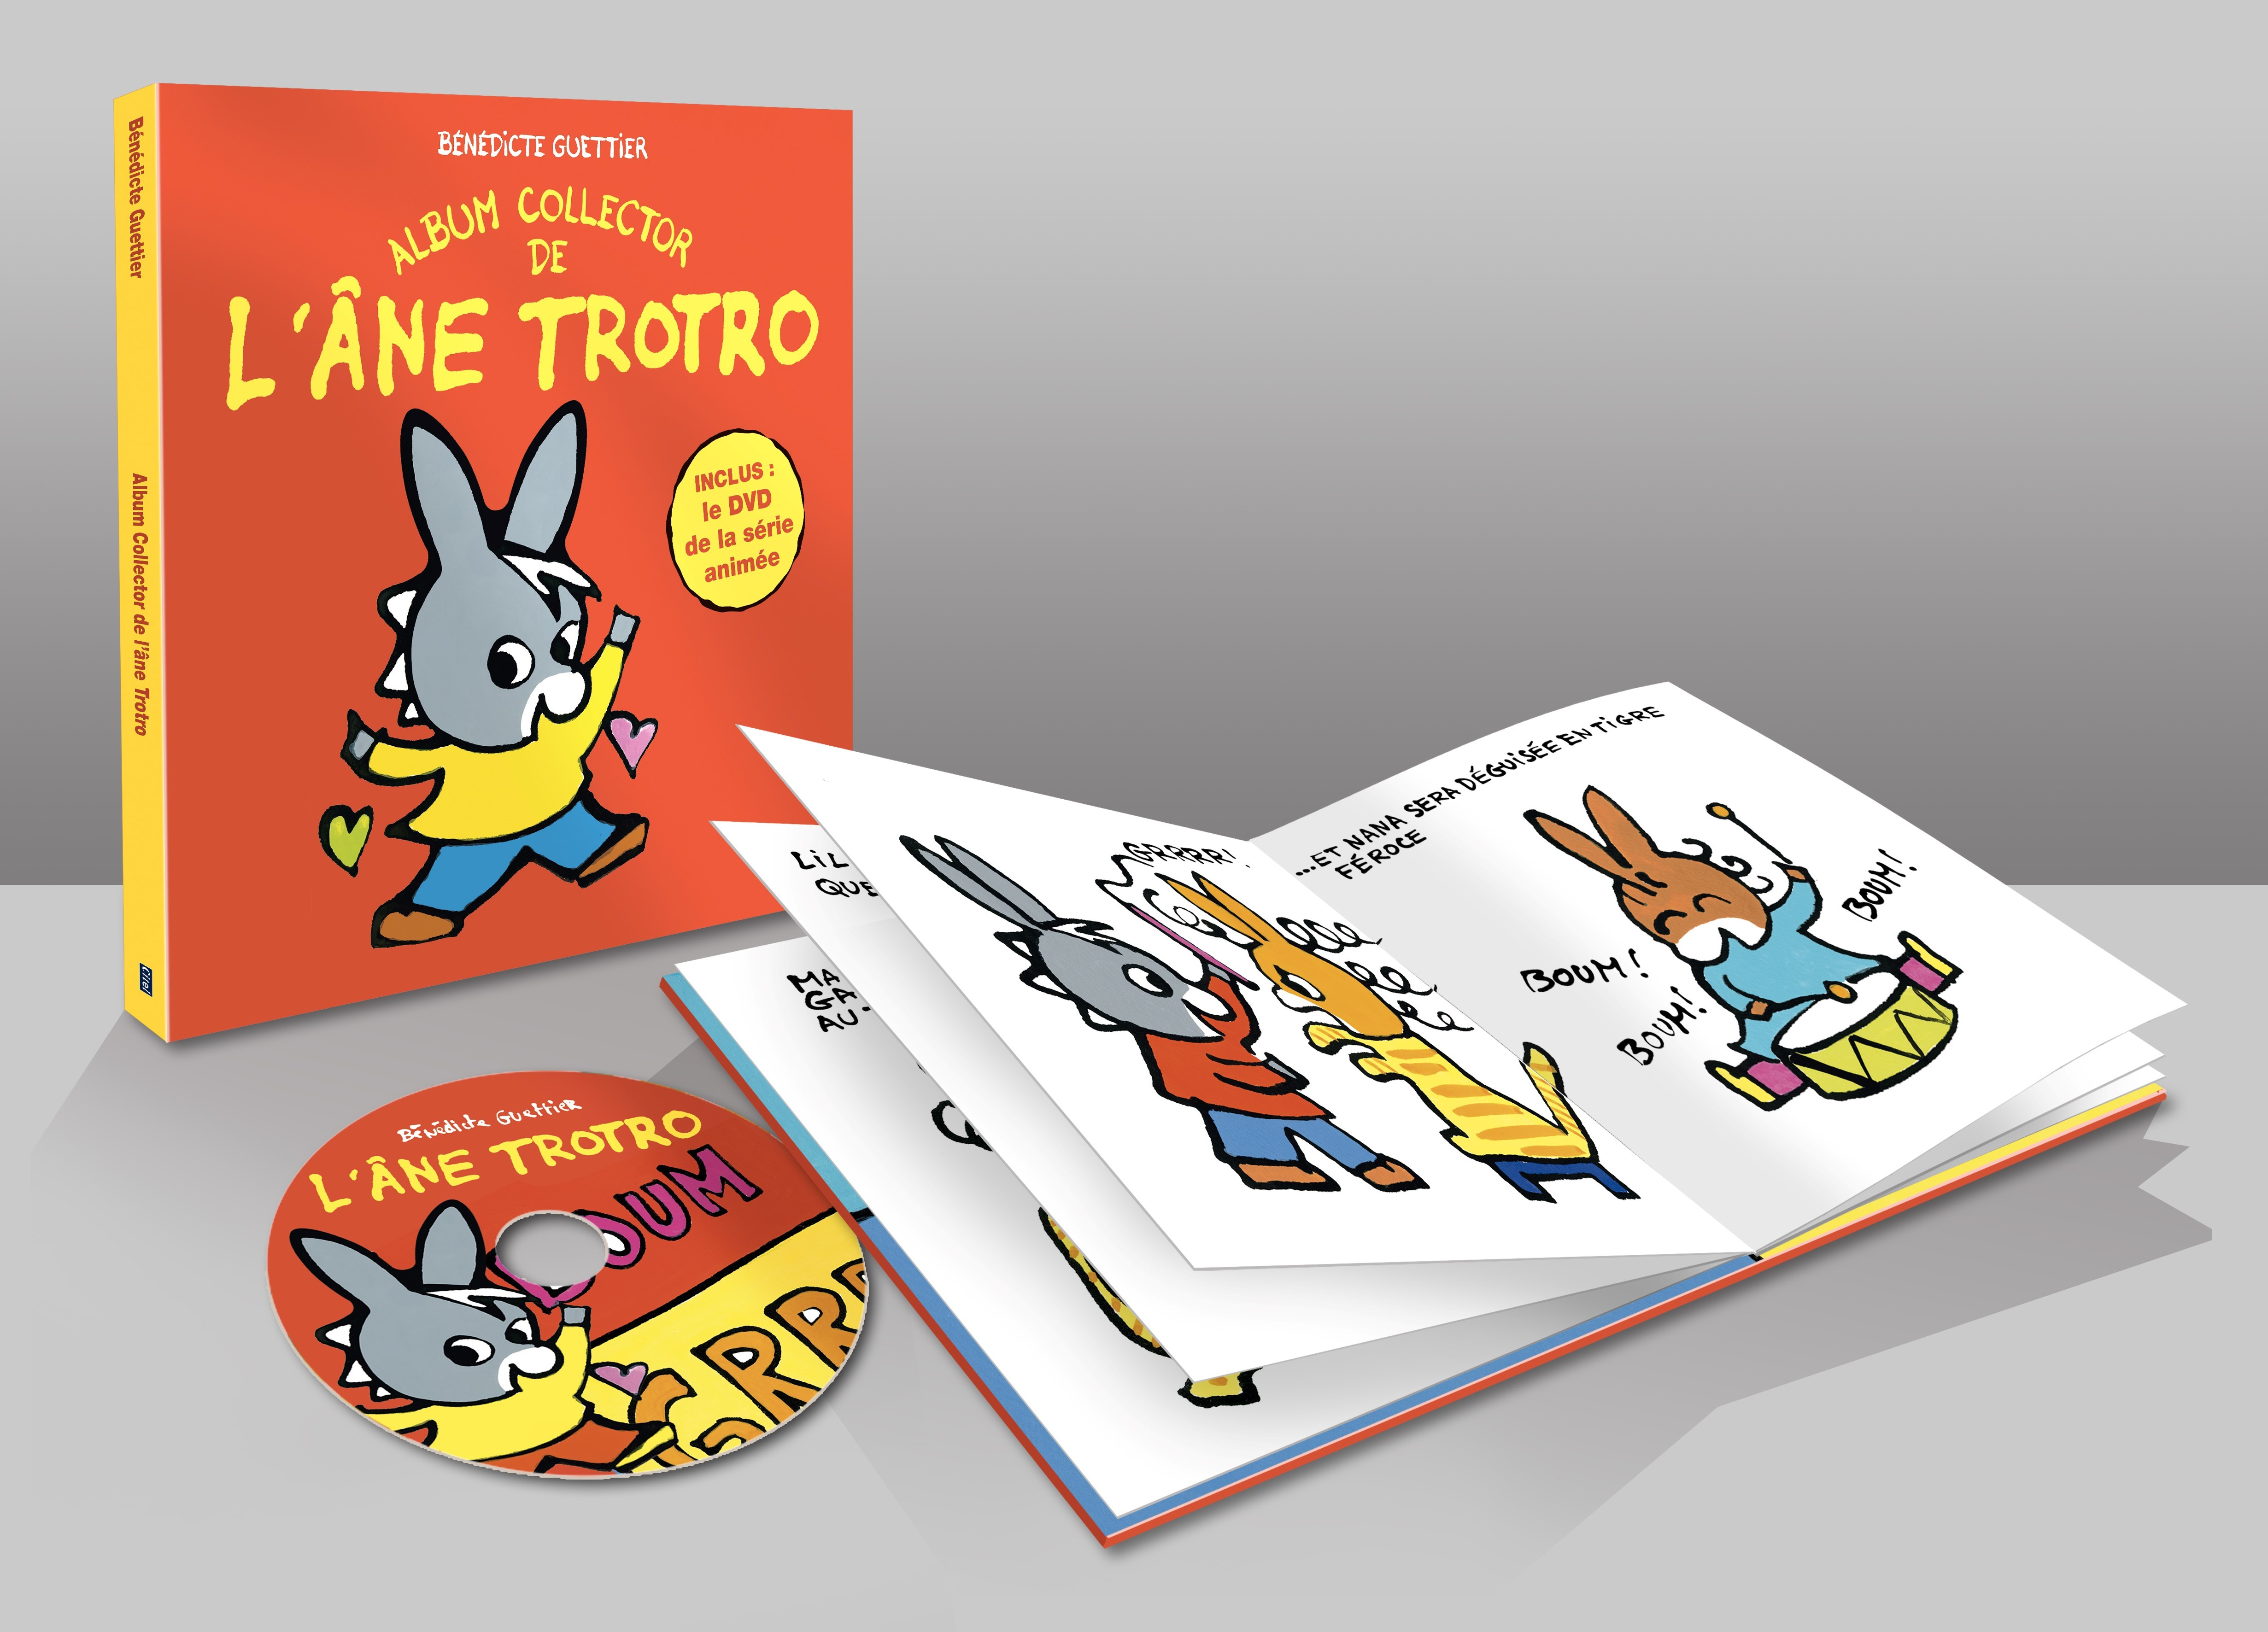 L'ANE TROTRO : 3 HISTOIRES + 1 DVD